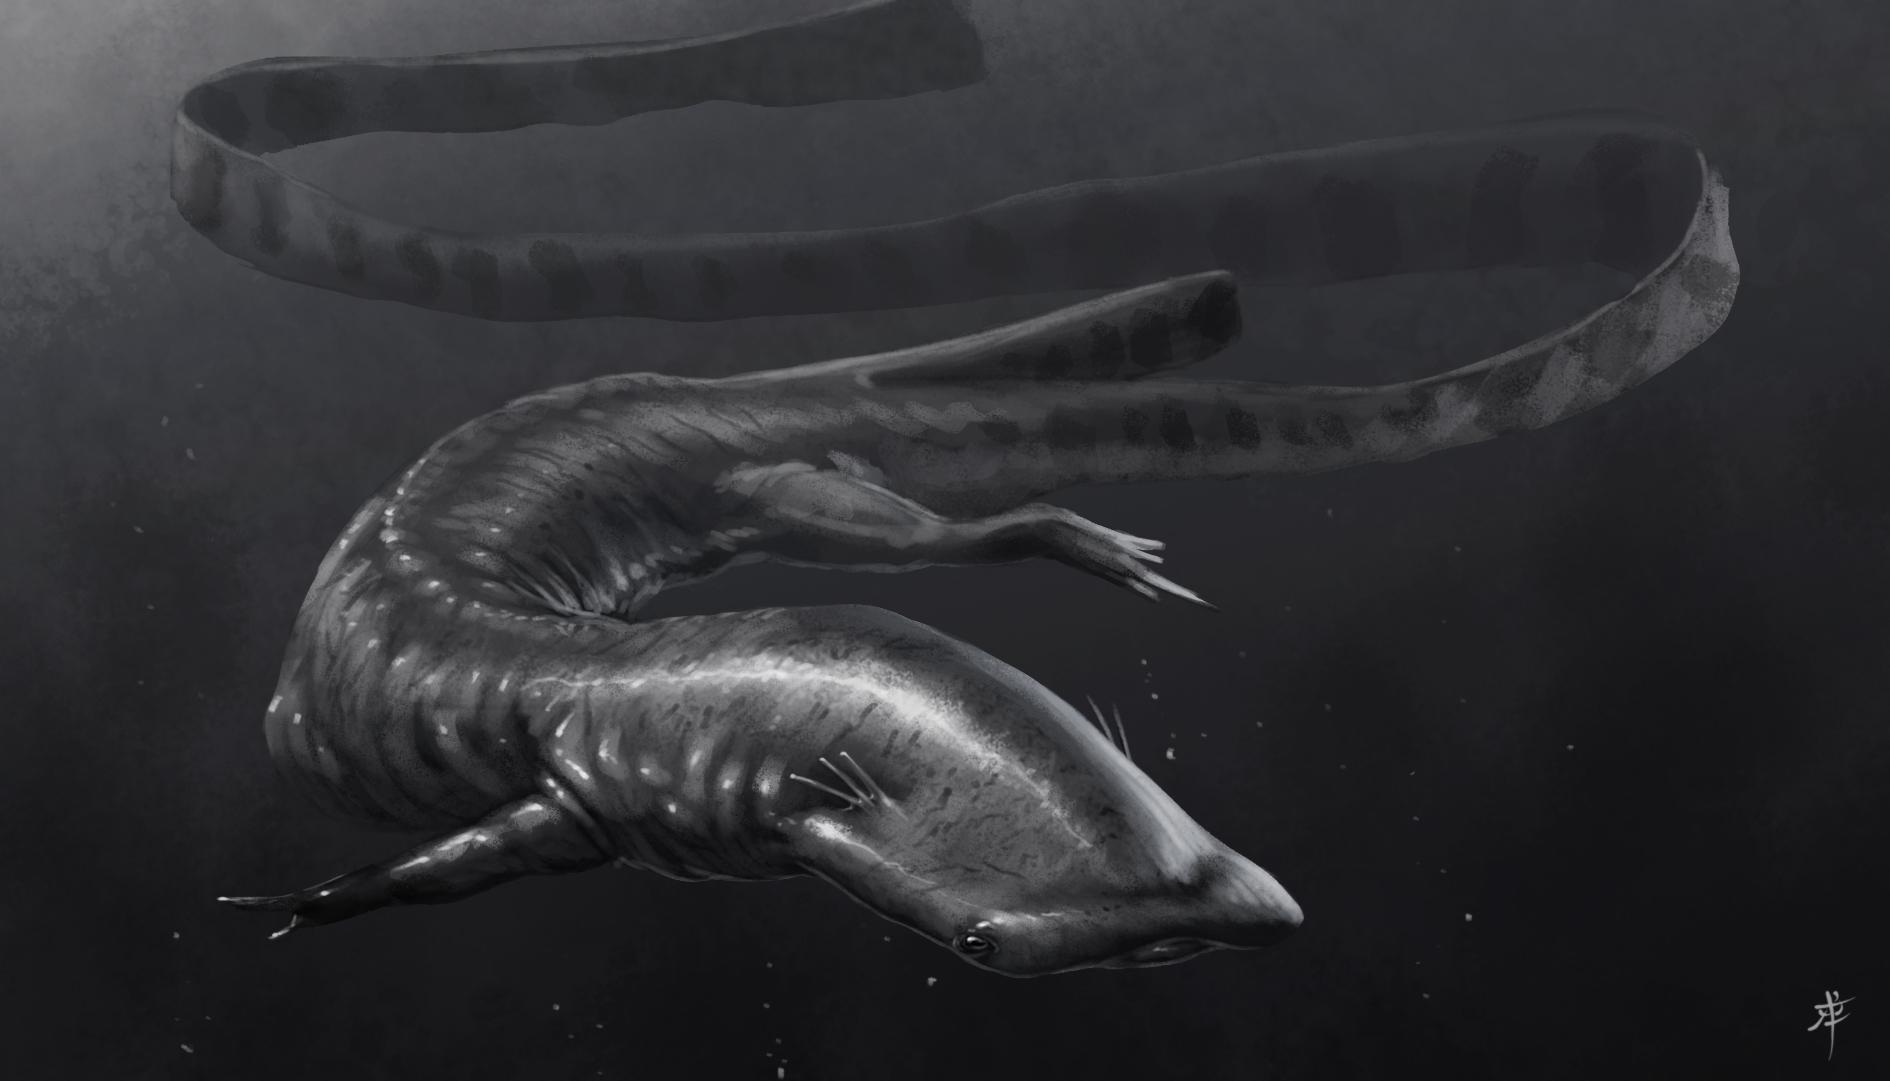 Salamandasaurus speedie by rob-powell